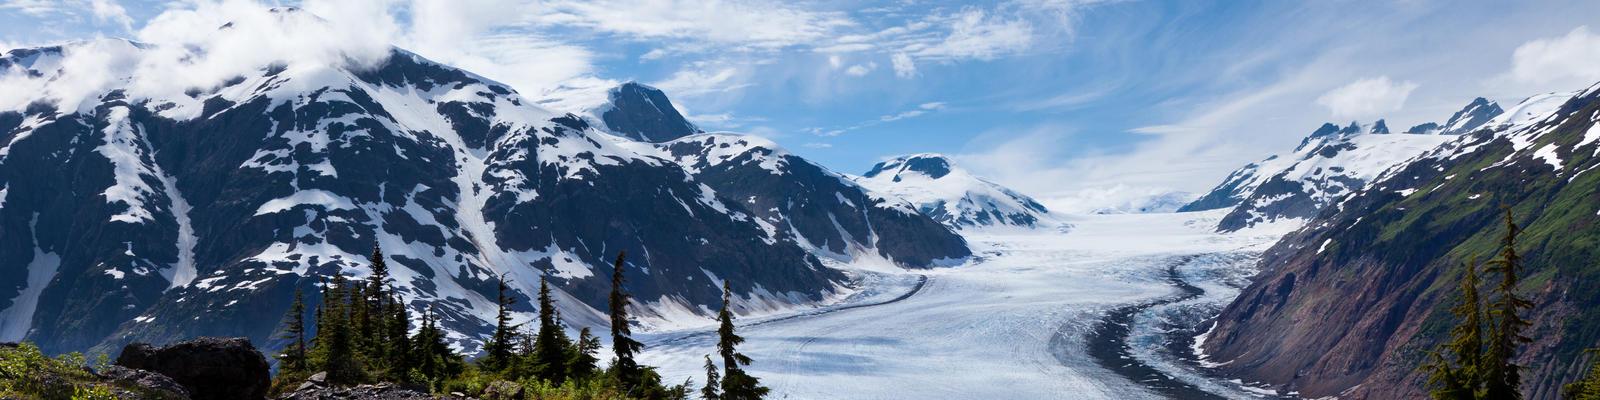 Alaska Cruise Tips (Photo: Feng Yu/Shustterstock.com)